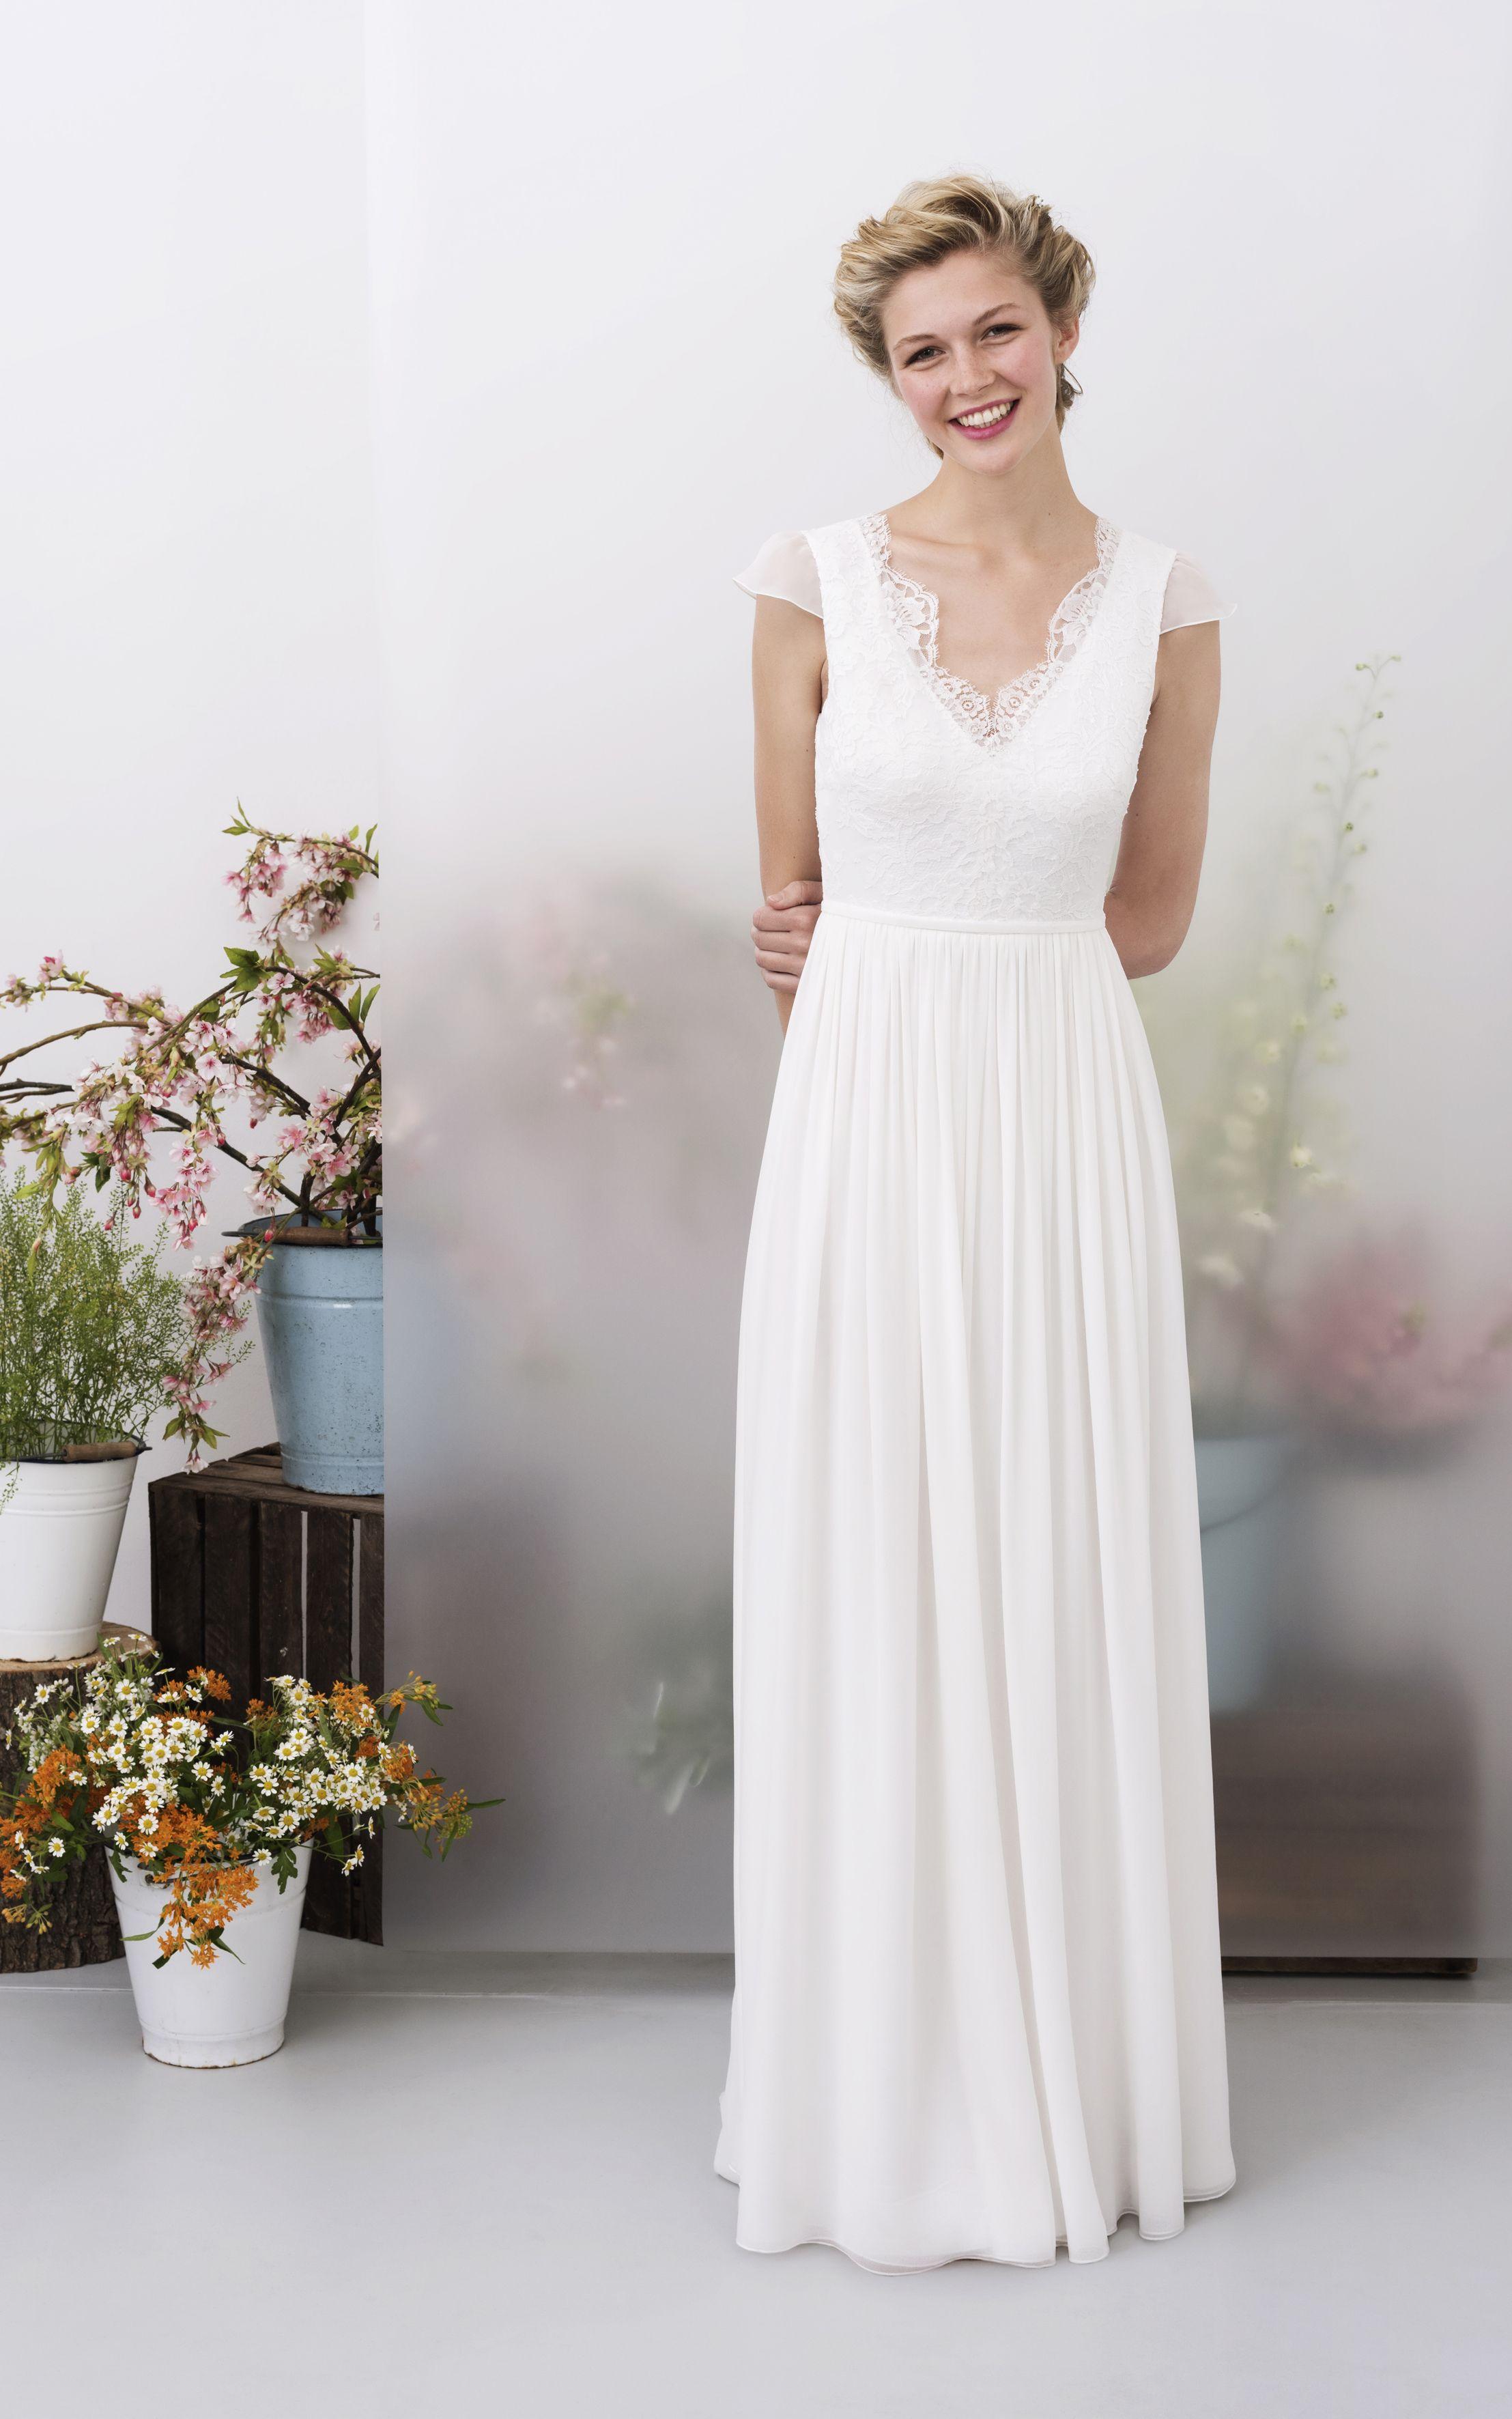 kisui OUI Collection Bridal Style: inja, Brautkleid, Weddingdress by ...